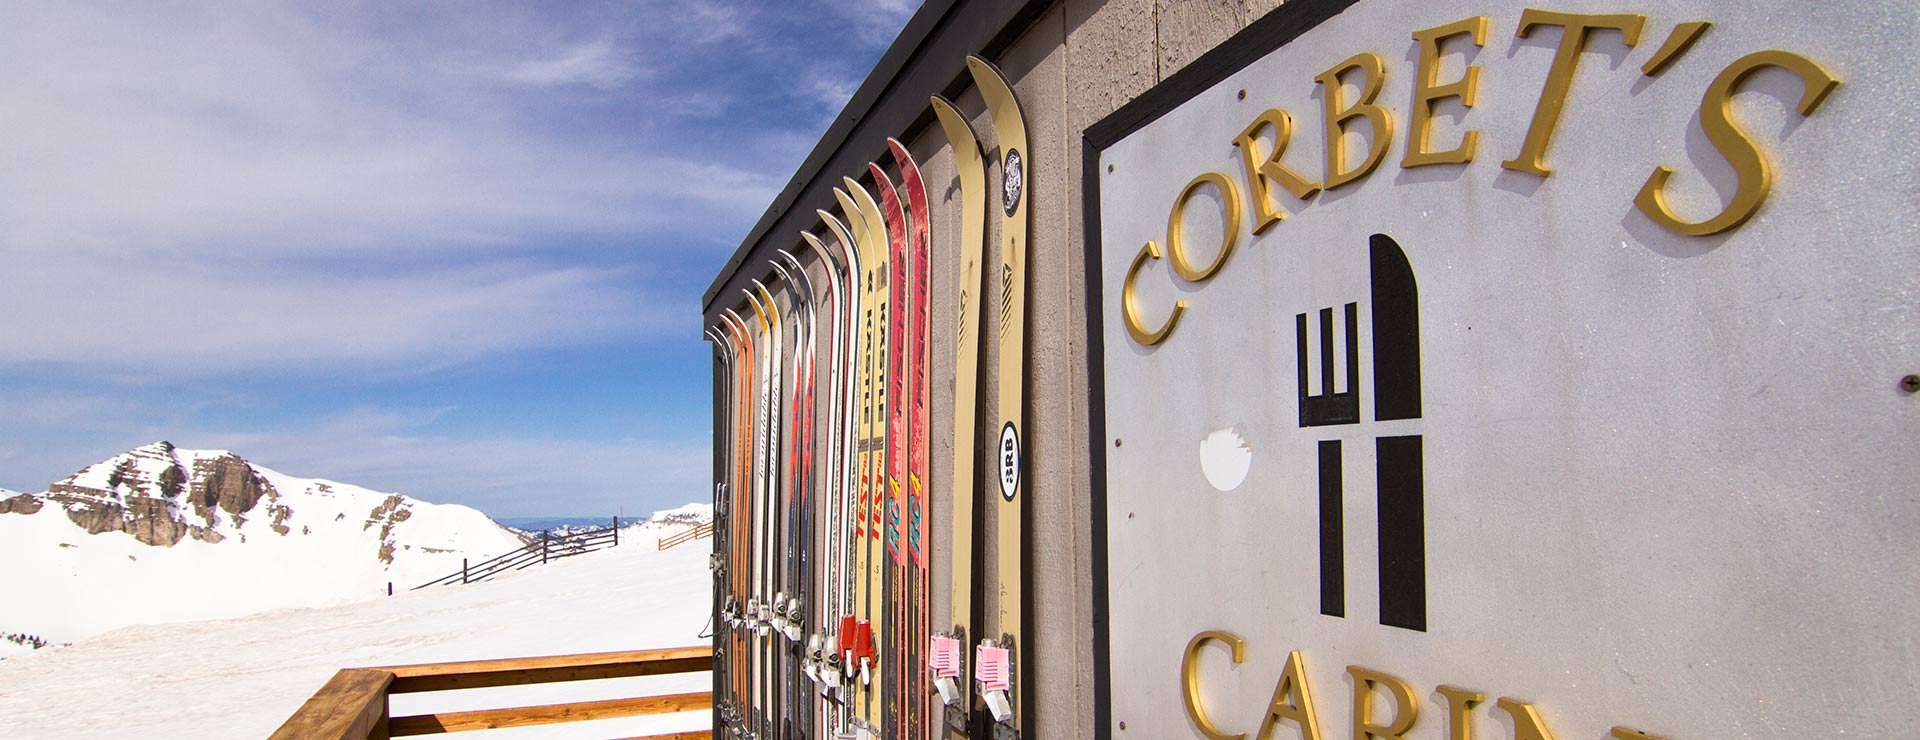 corbetts cabin